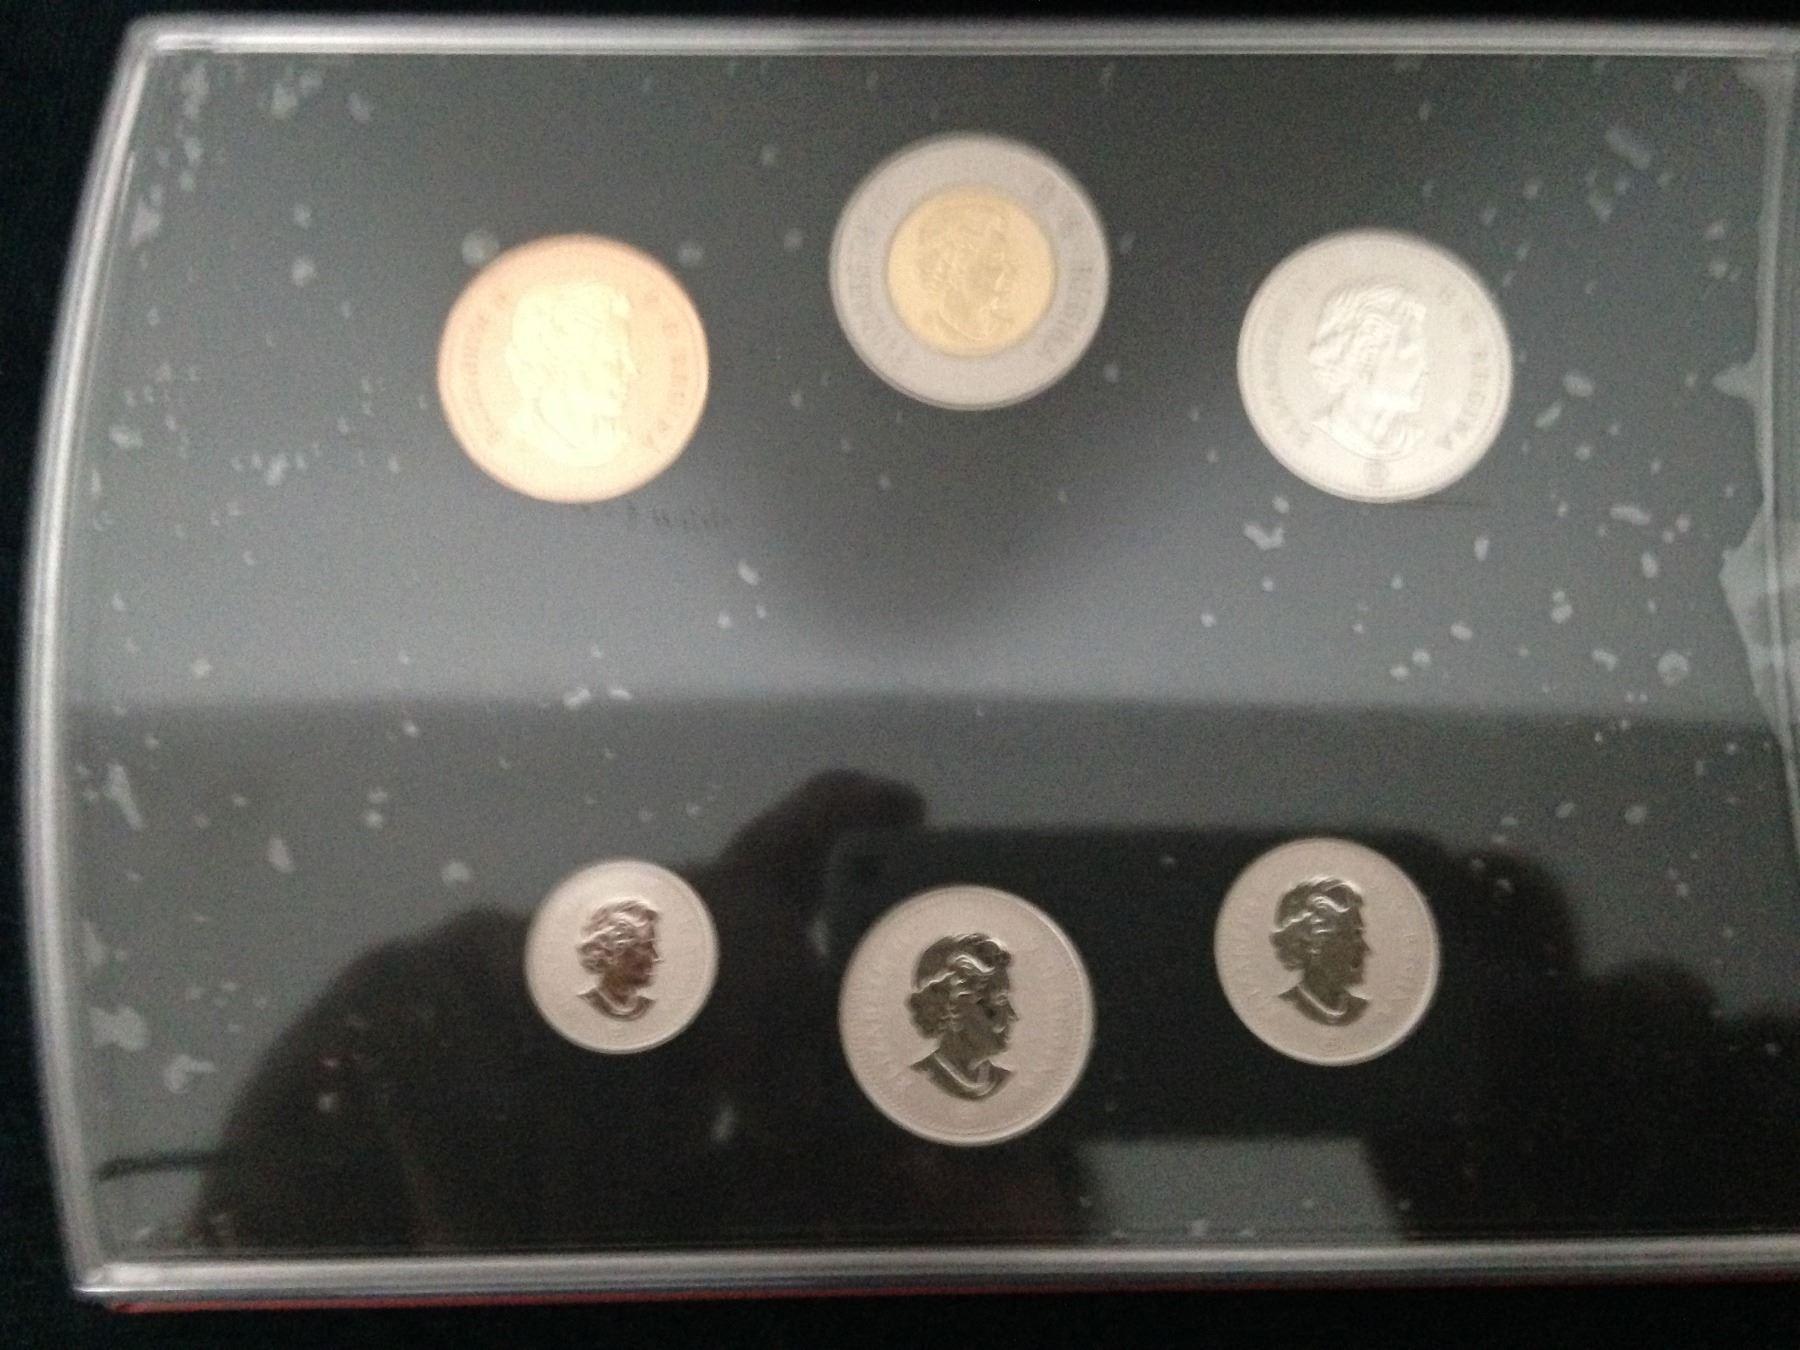 Black Bear $2 Coin 2013 Canada Specimen Set Young Wildlife